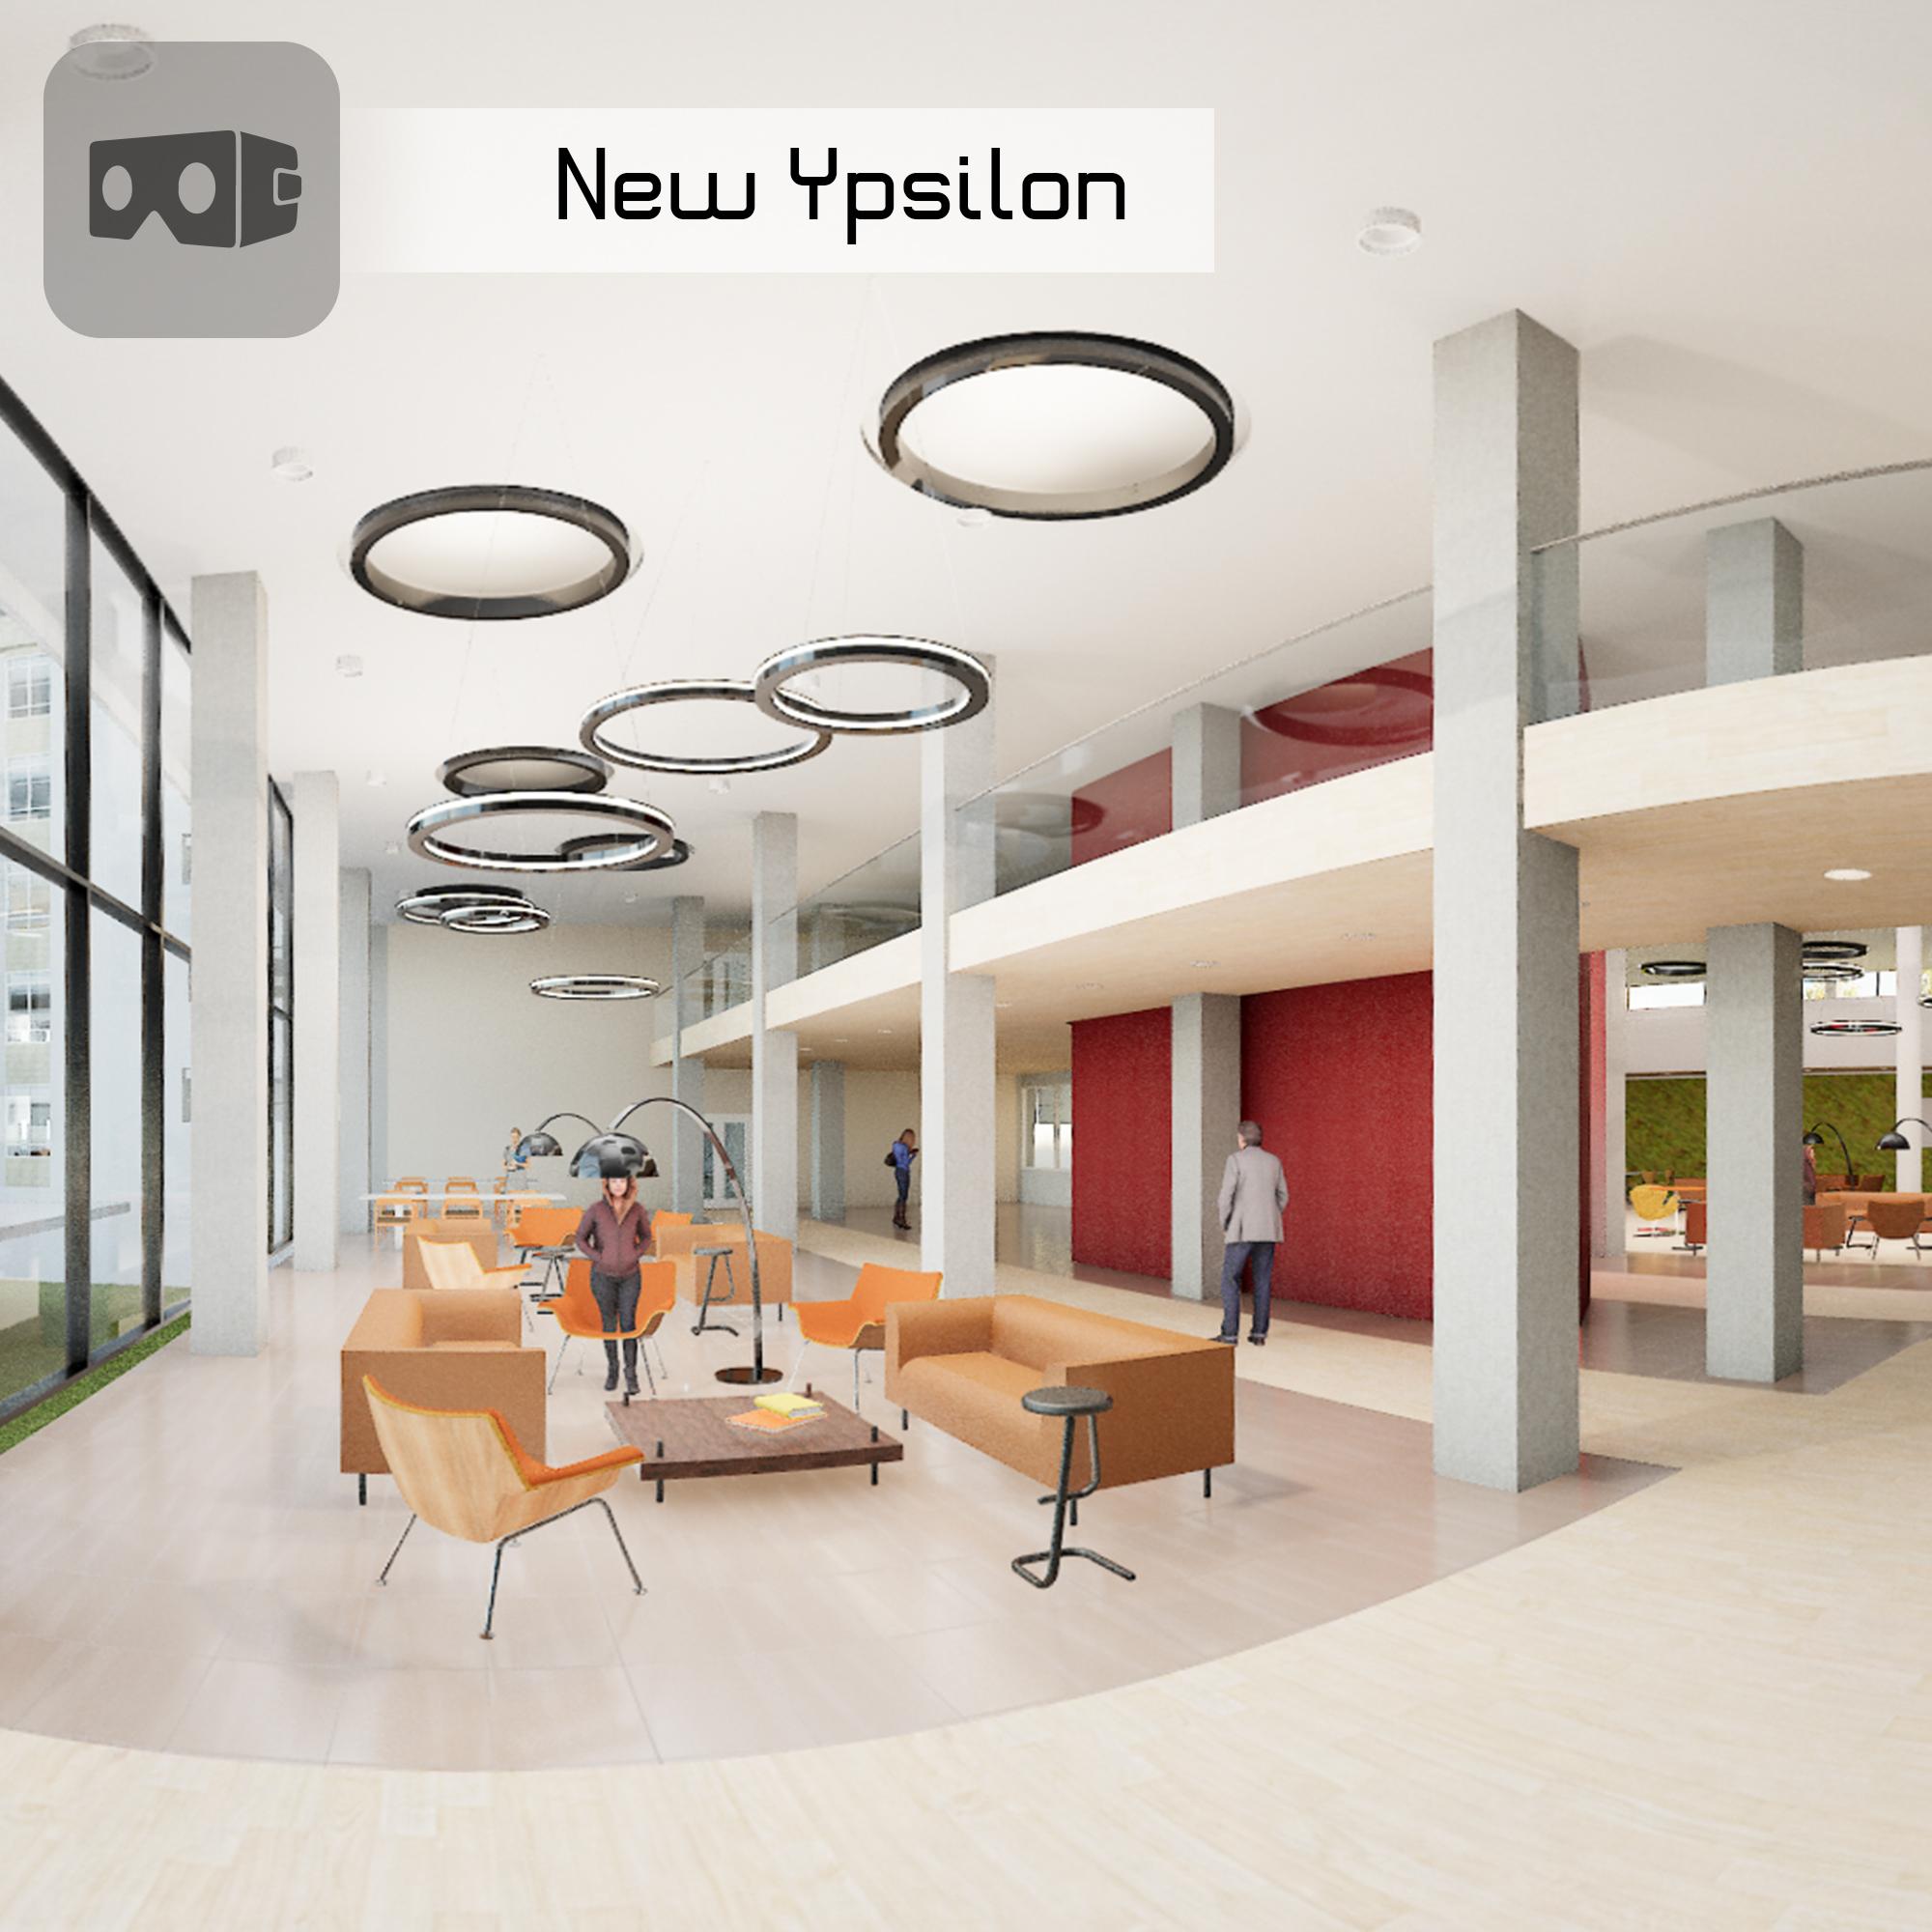 Office transformation